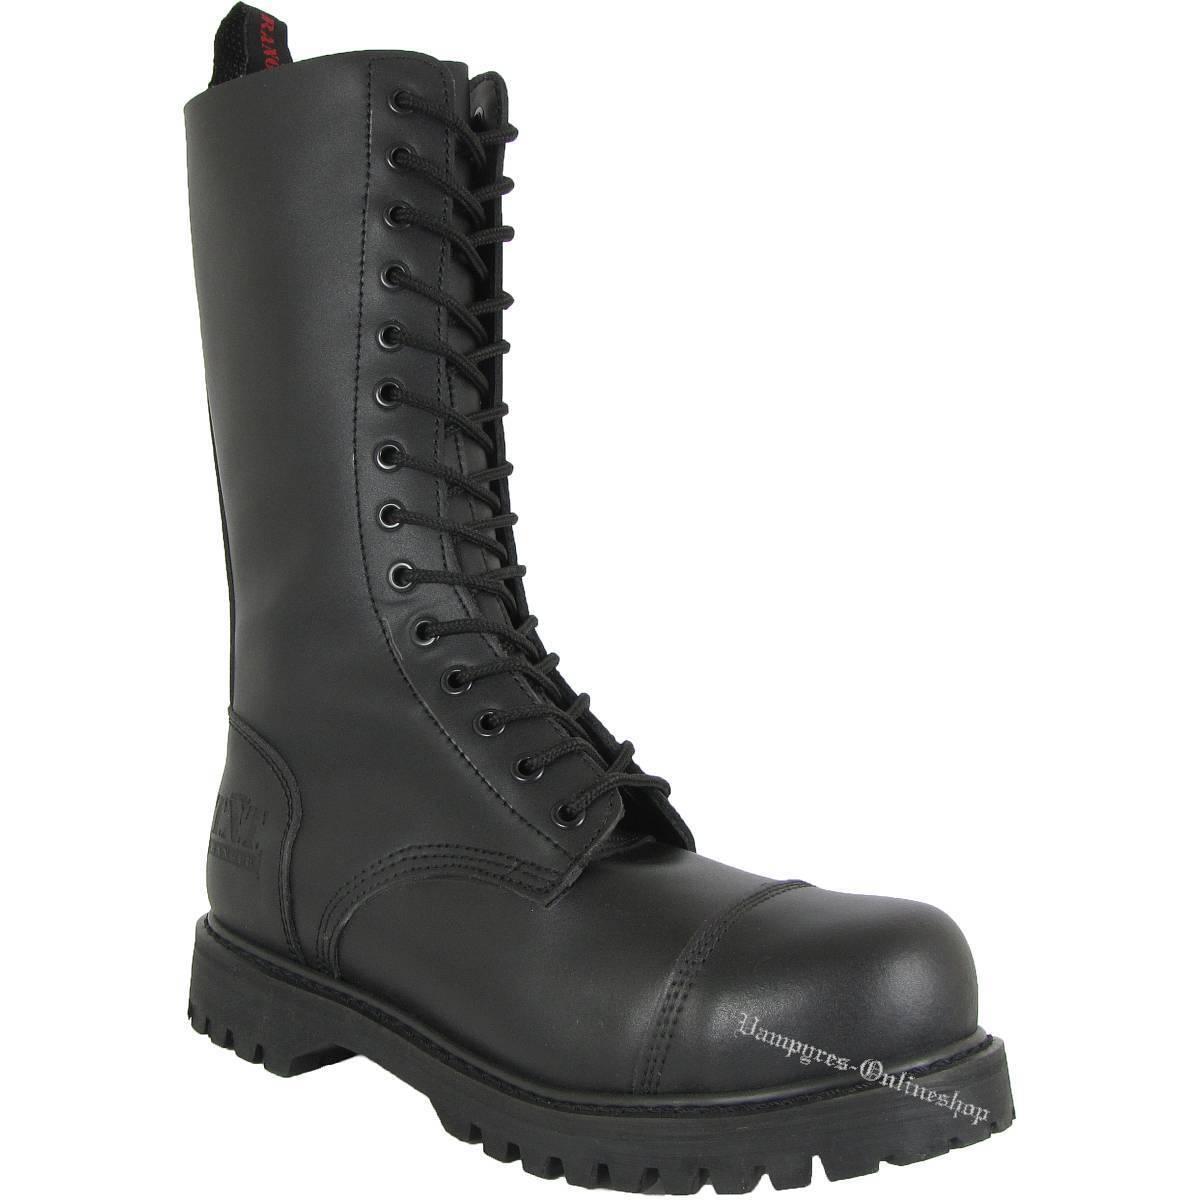 TNT 14-Loch Stiefel Side-Zip Schwarz Rangers Leder Boots Stahlkappen Schuhe Noir